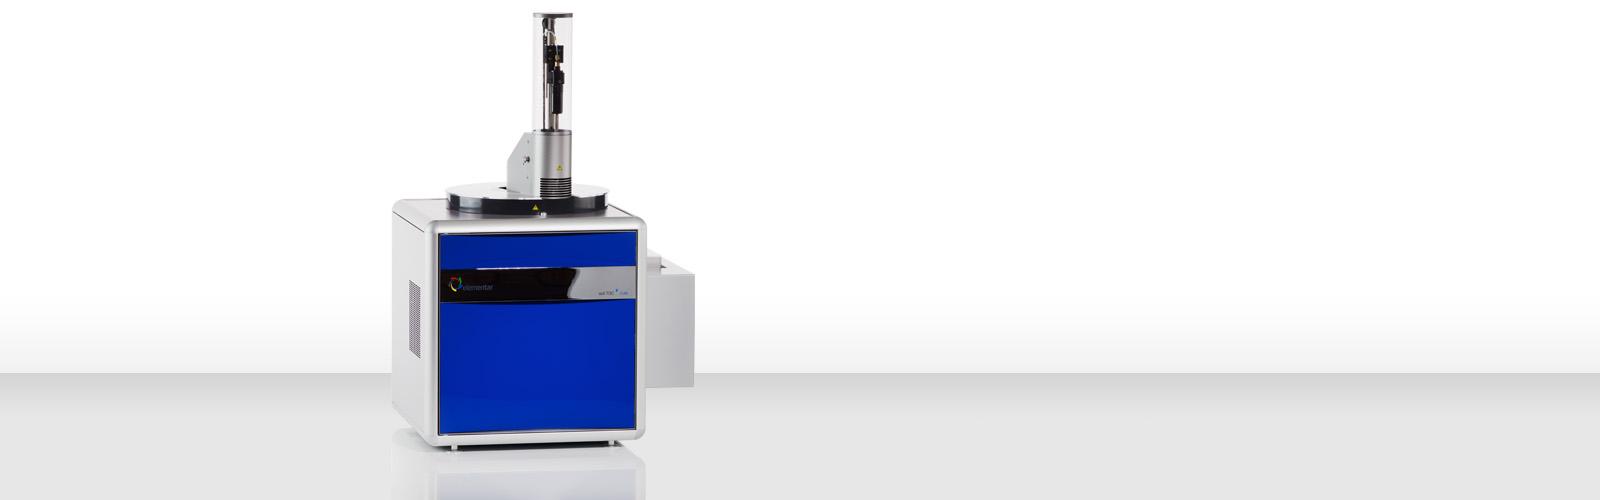 elementar水质分析仪 TOC分析仪 soli TOC cube